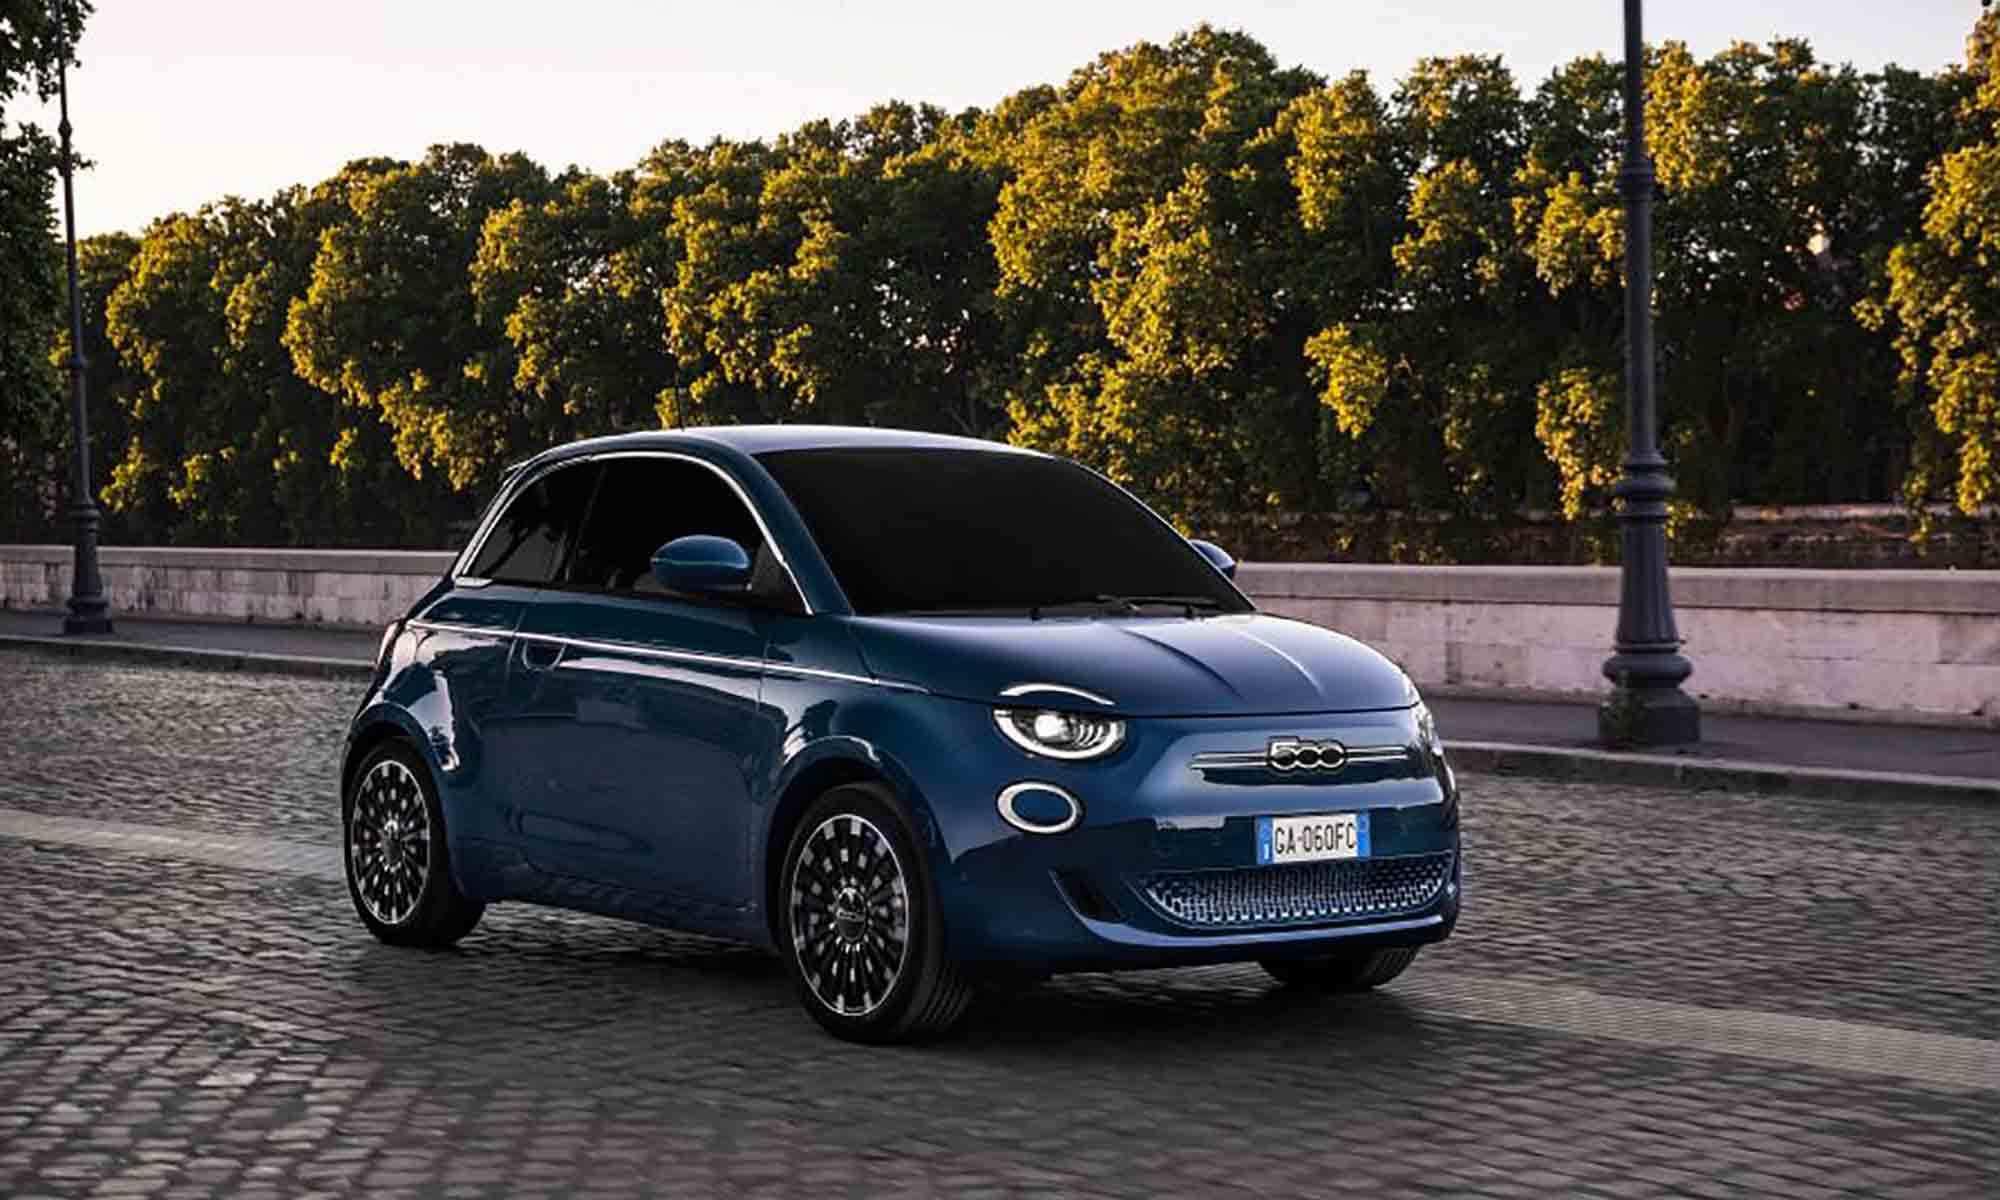 Fiat 500 Lifestyle